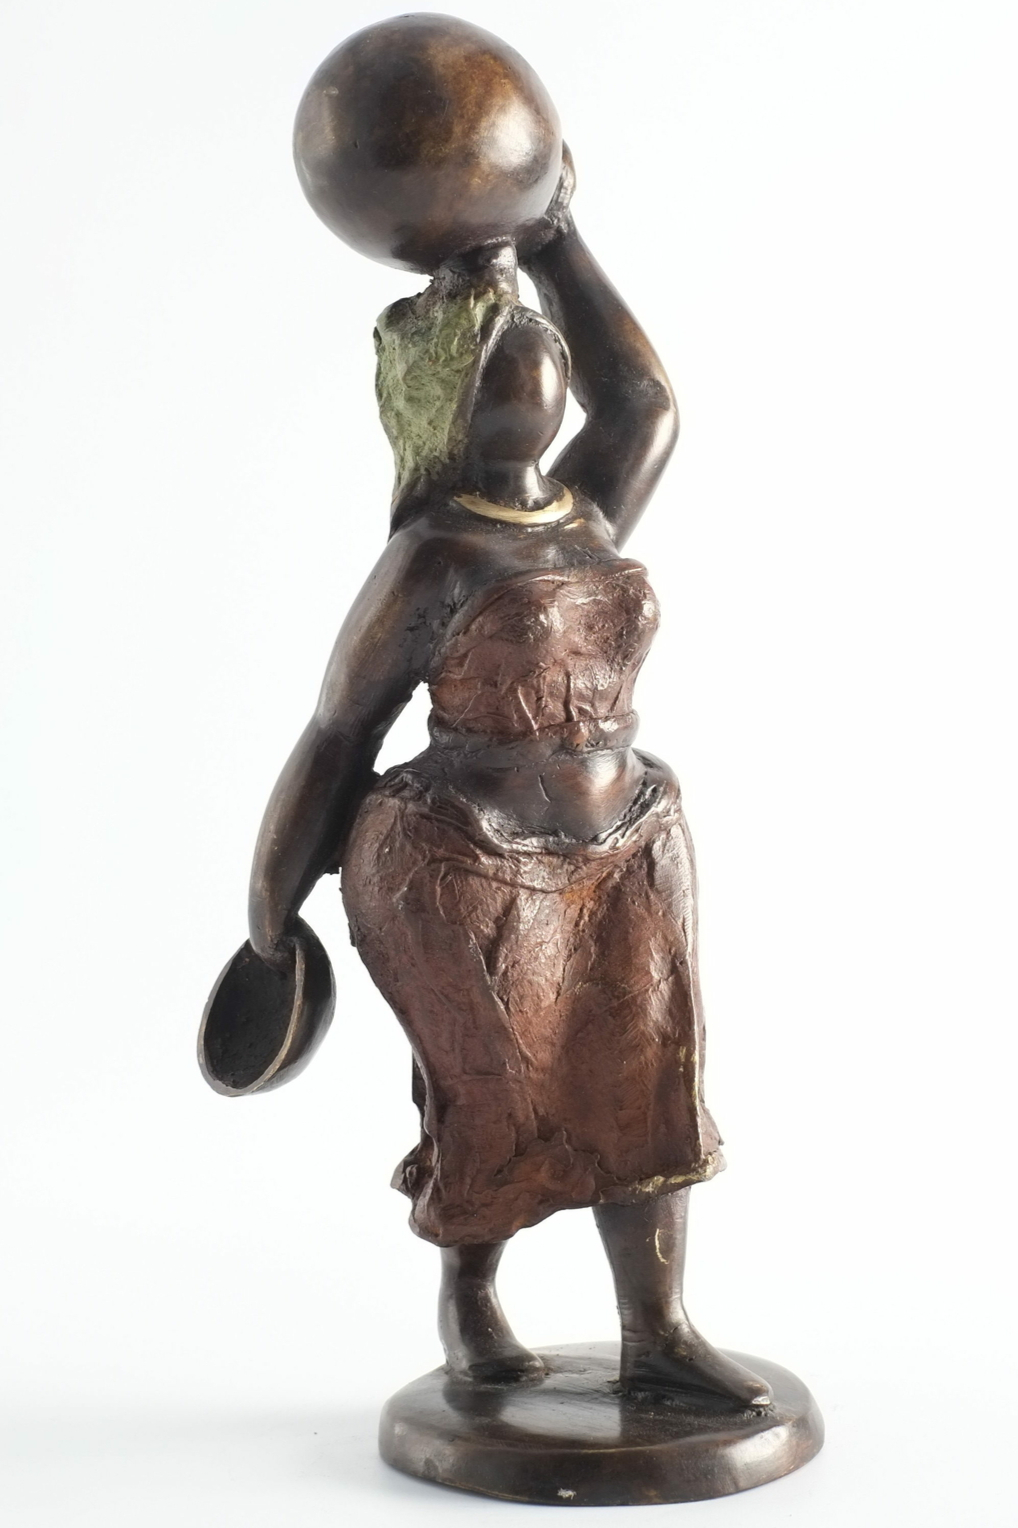 Statue de femme en bronze du Burkina Faso - VENDUE